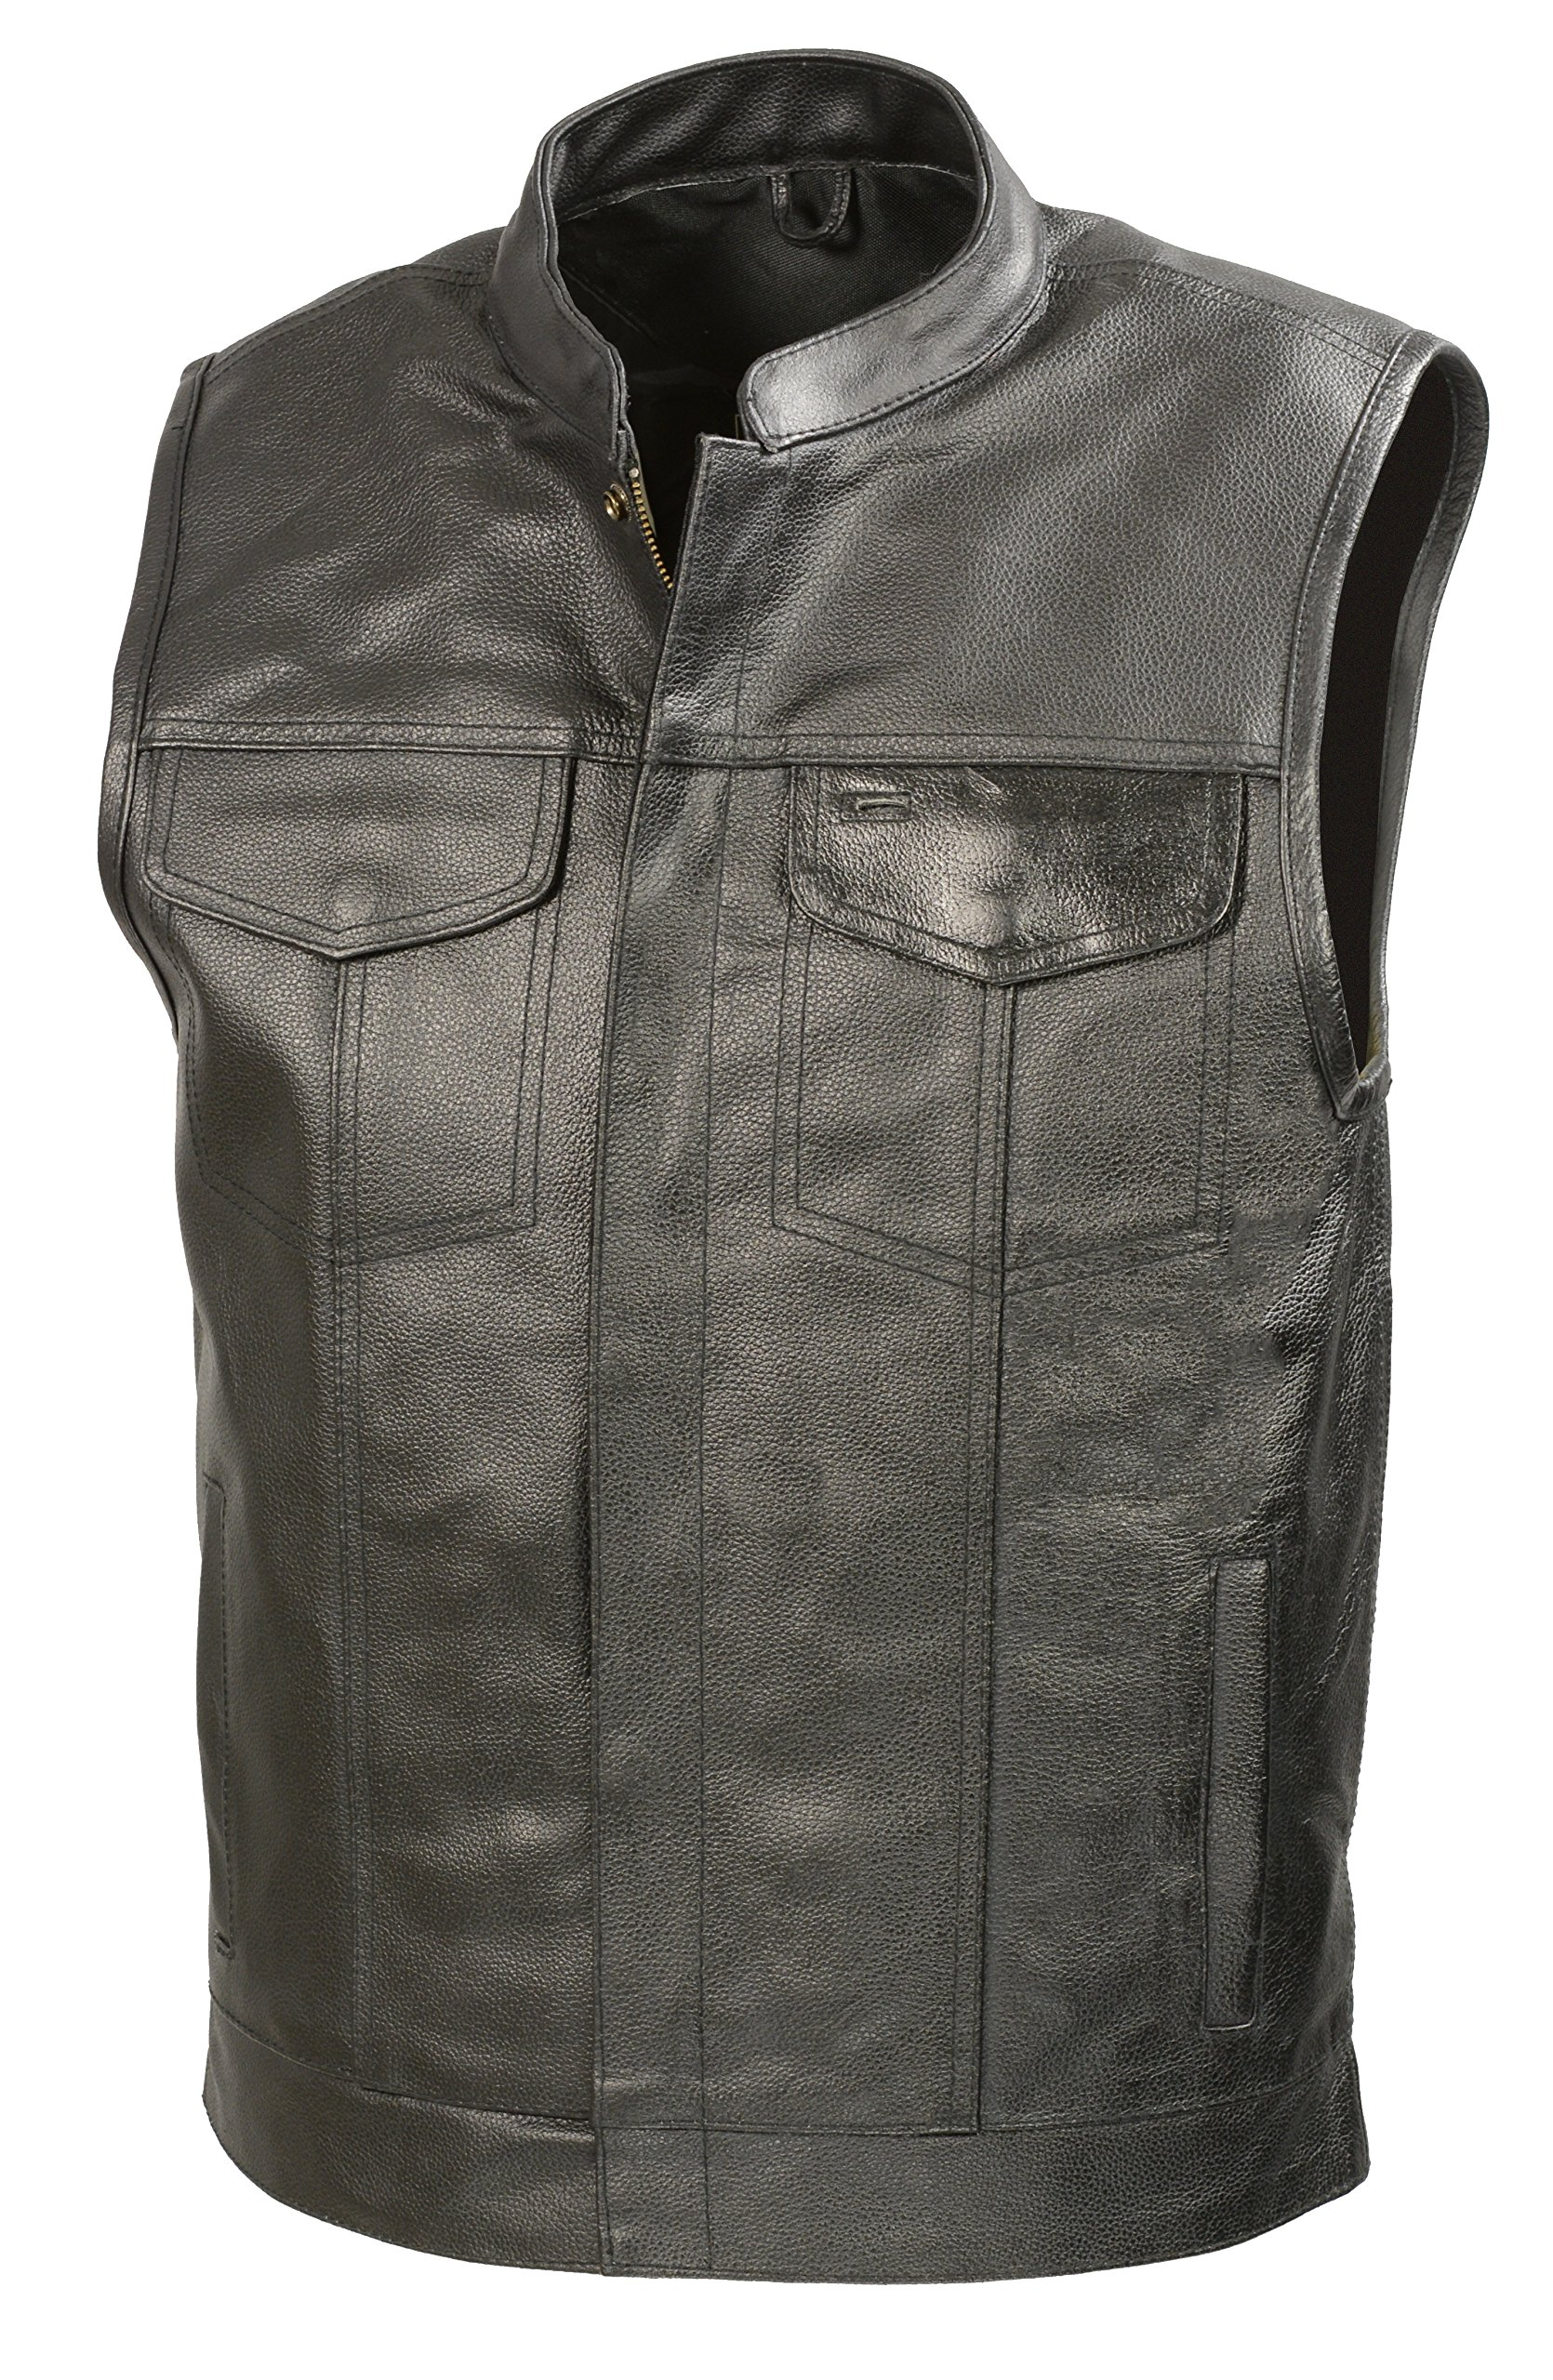 SOA Mens Leather Club Style Vest W/Gun Pockets, Leather Biker Vest (Black, M)